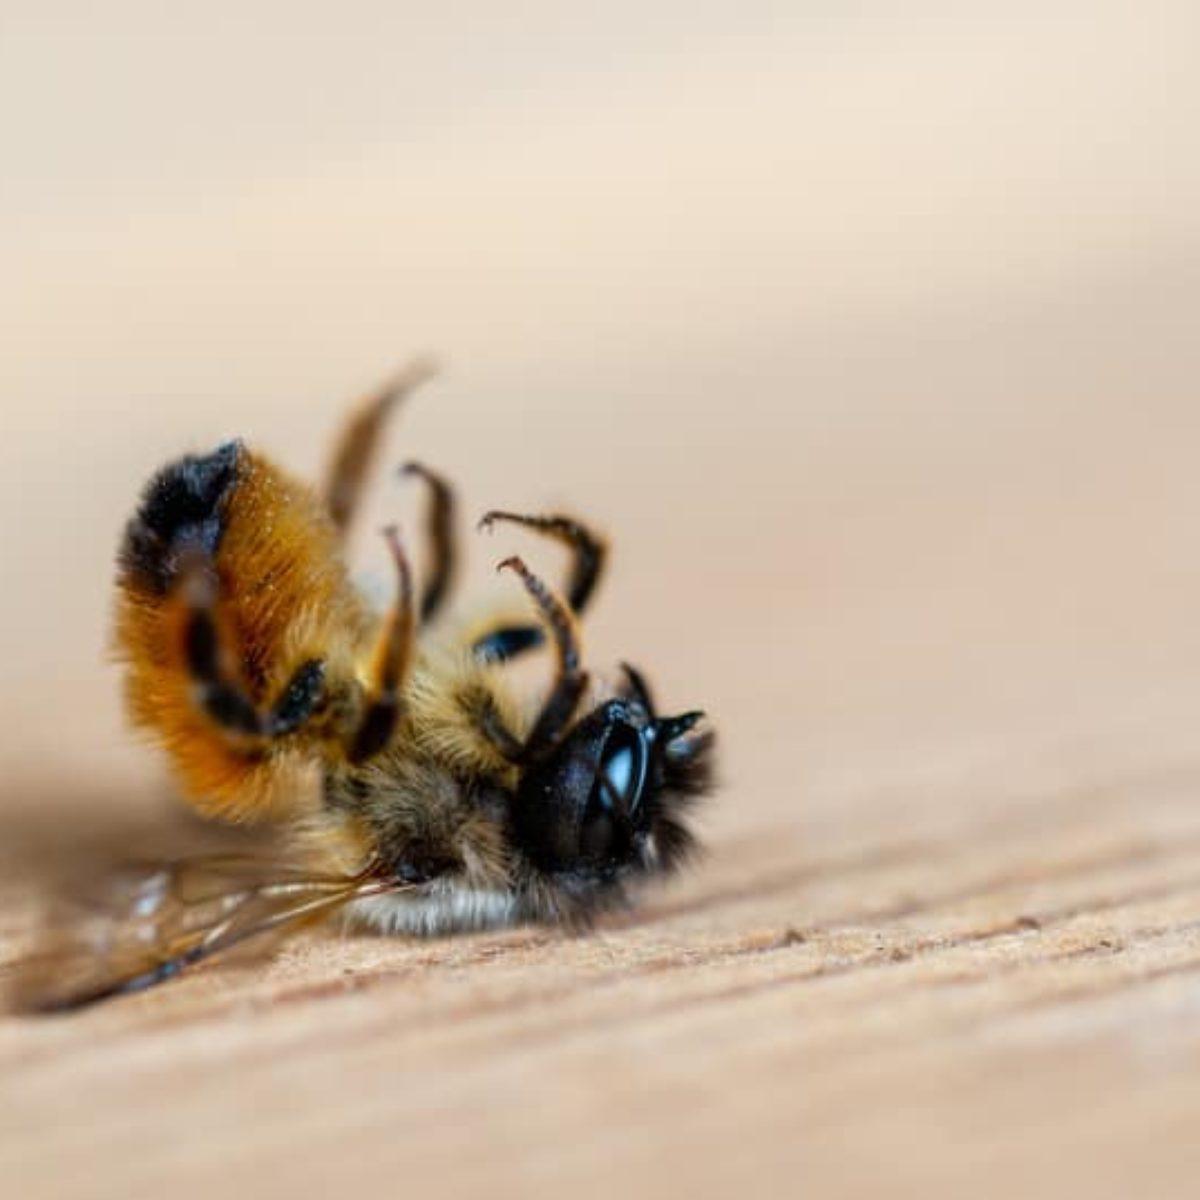 Glyphosate poisoned bee